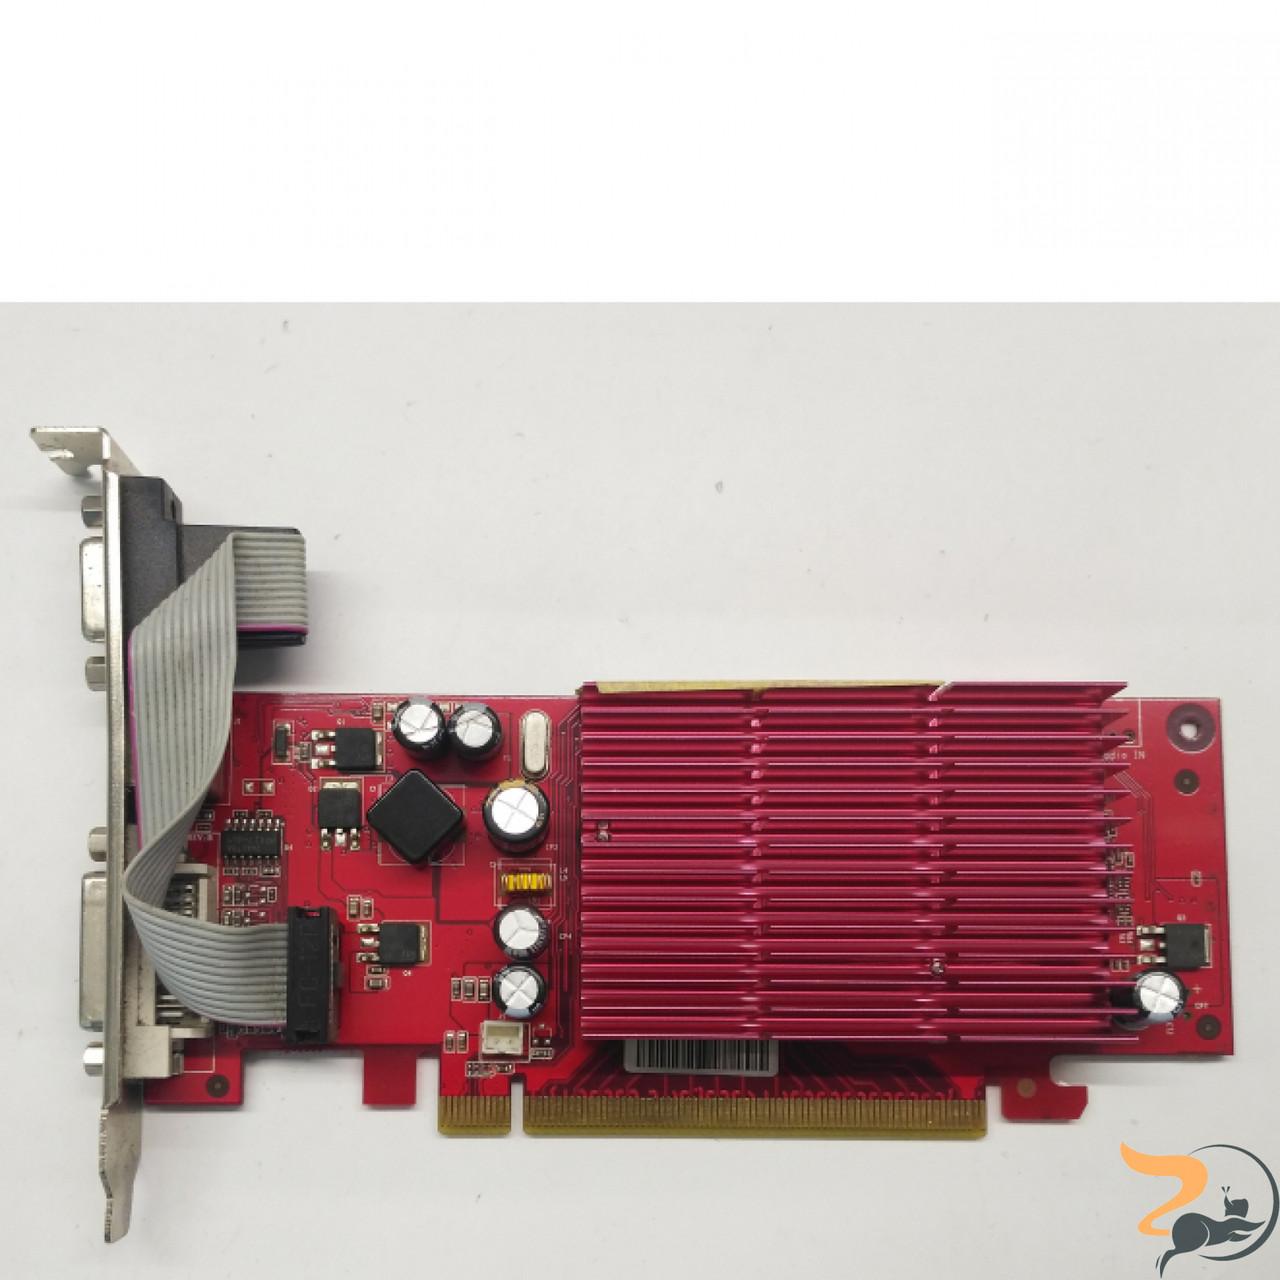 PALIT 7200GS PCI-E 256MB DRIVER FOR WINDOWS 7